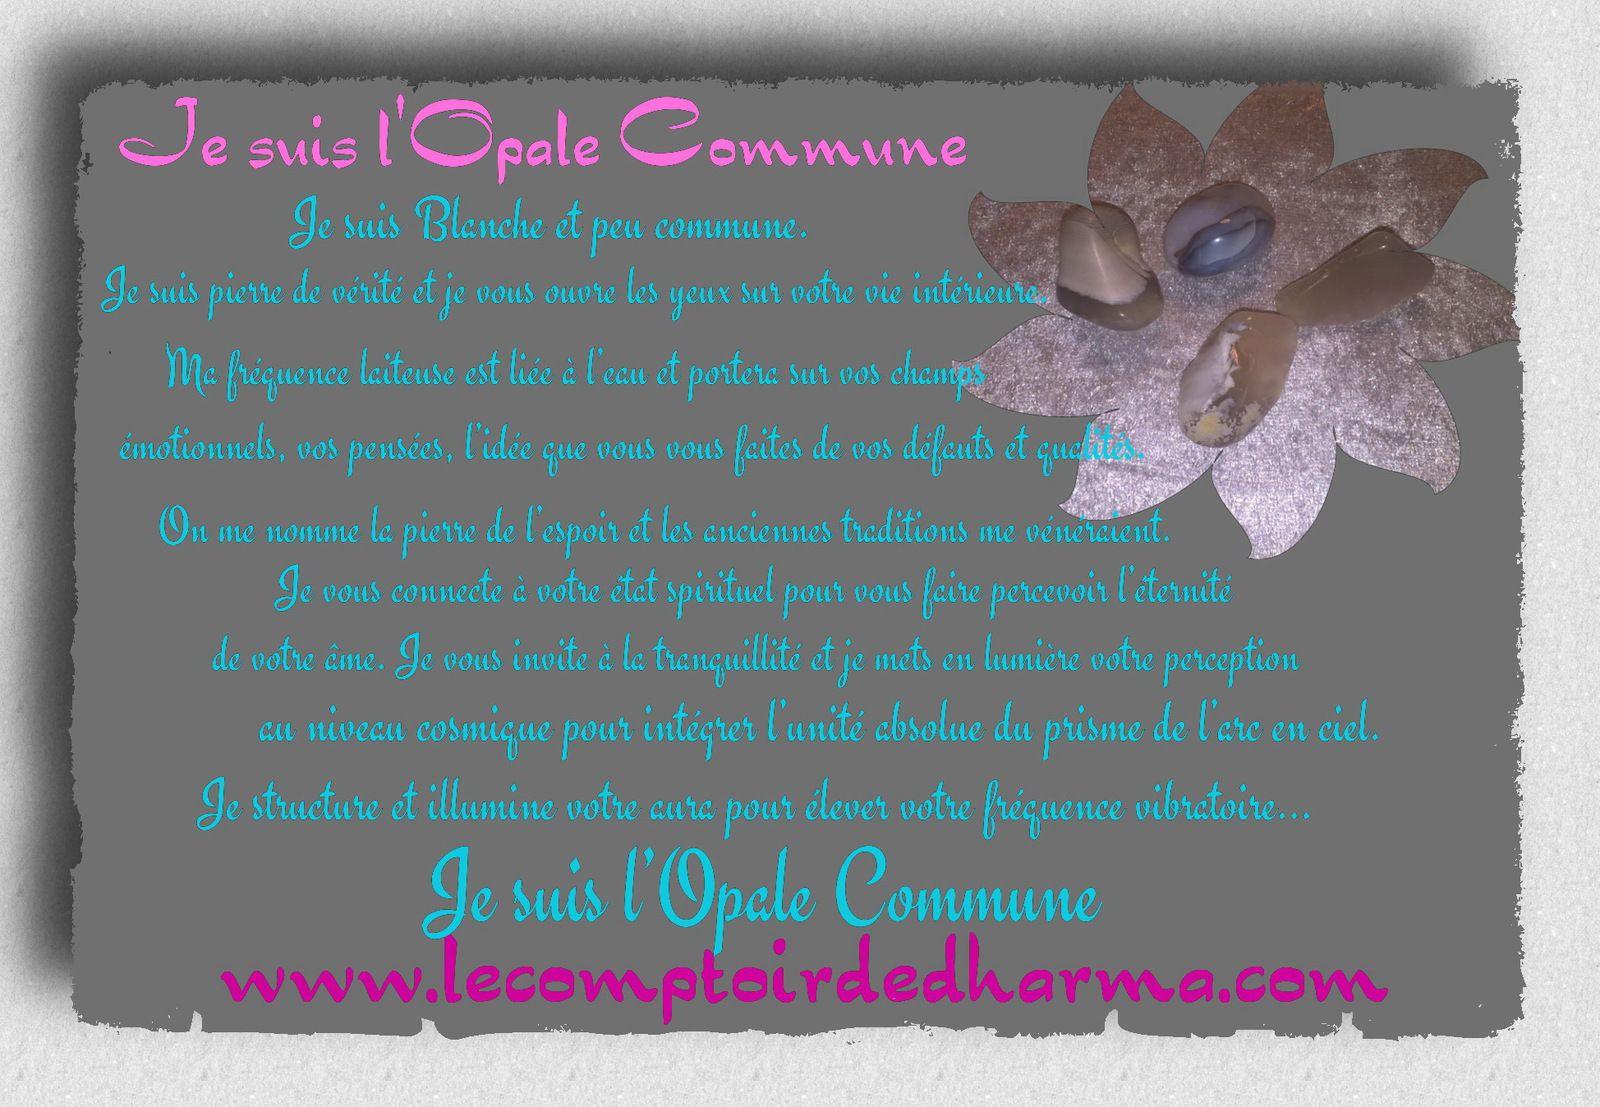 l'Opale Commune